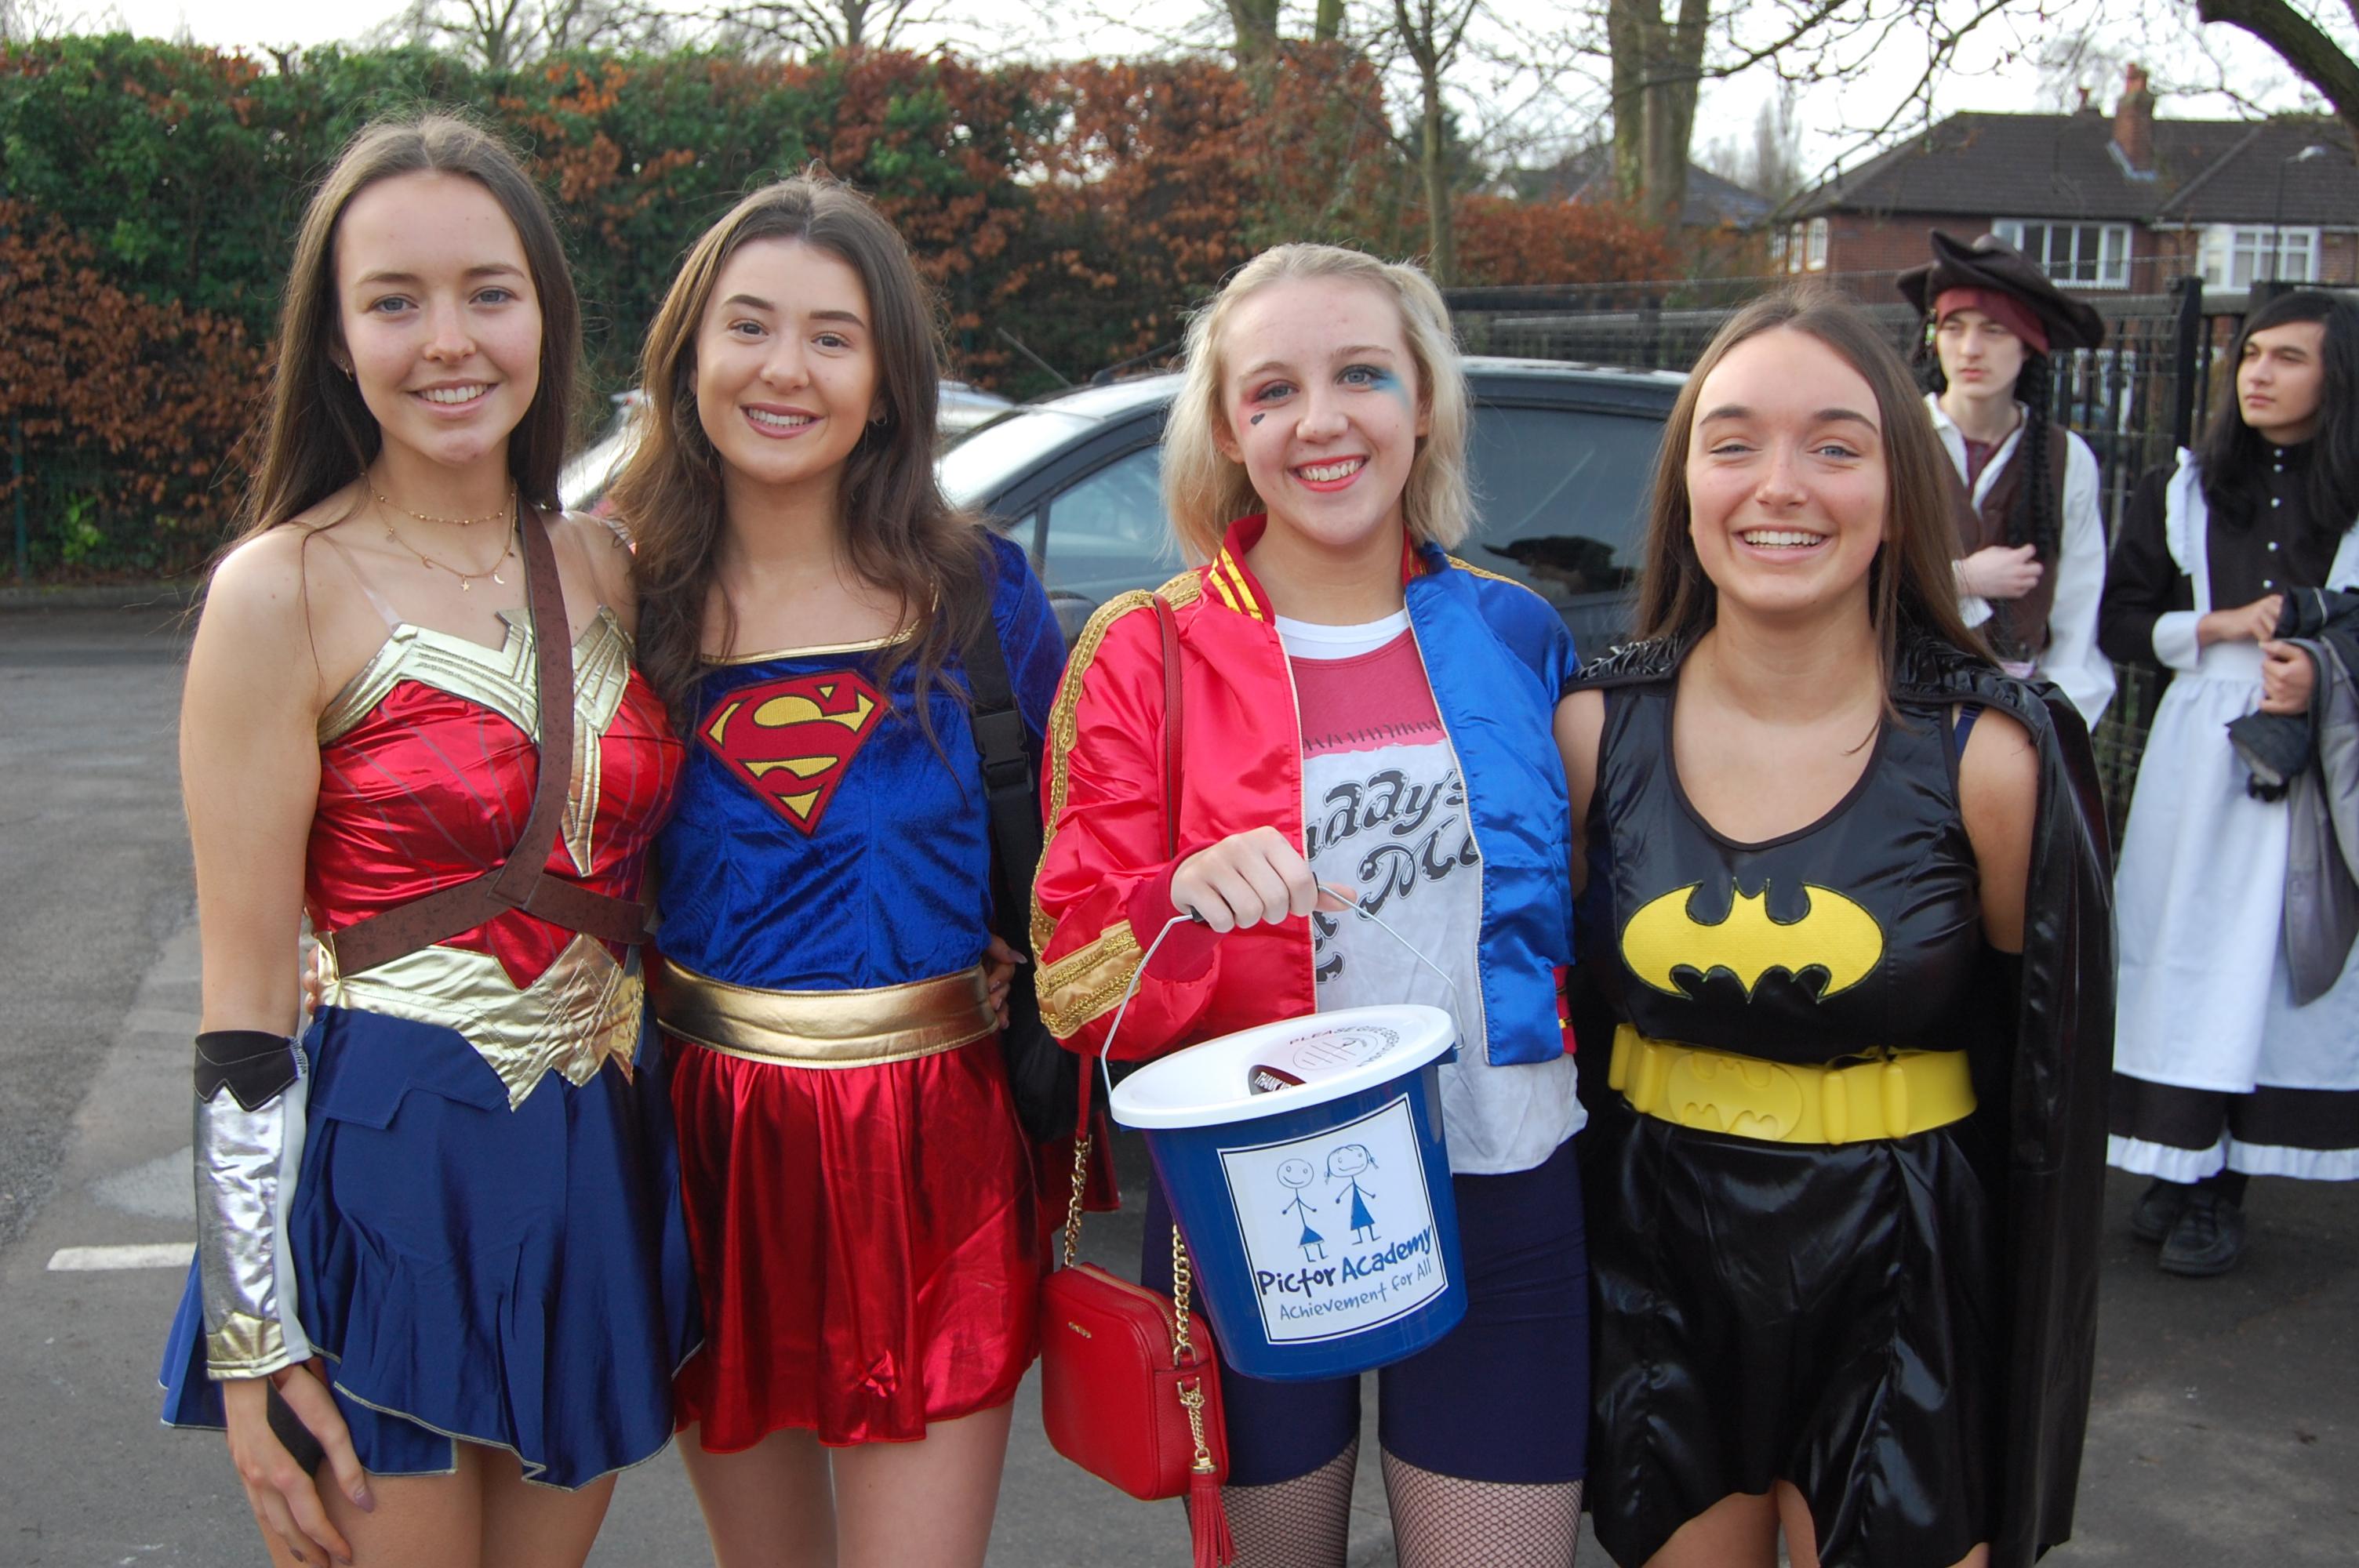 Wellington superheroes ready for action